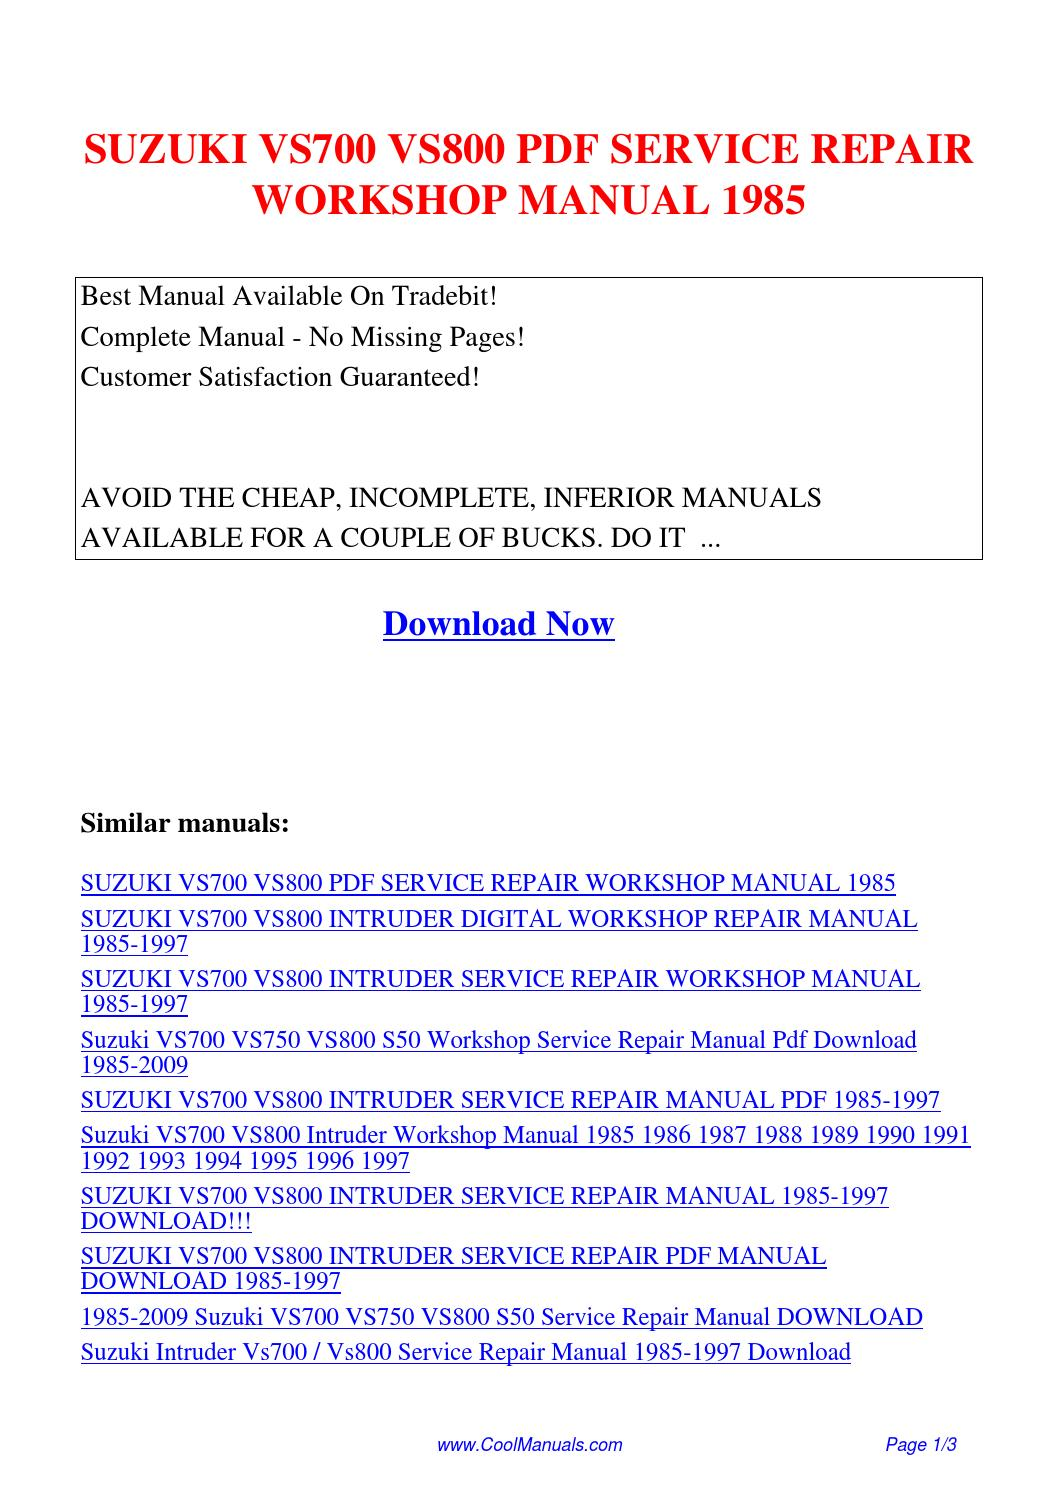 SUZUKI VS700 VS800 SERVICE REPAIR WORKSHOP MANUAL 1985.pdf by Linda Pong -  issuu